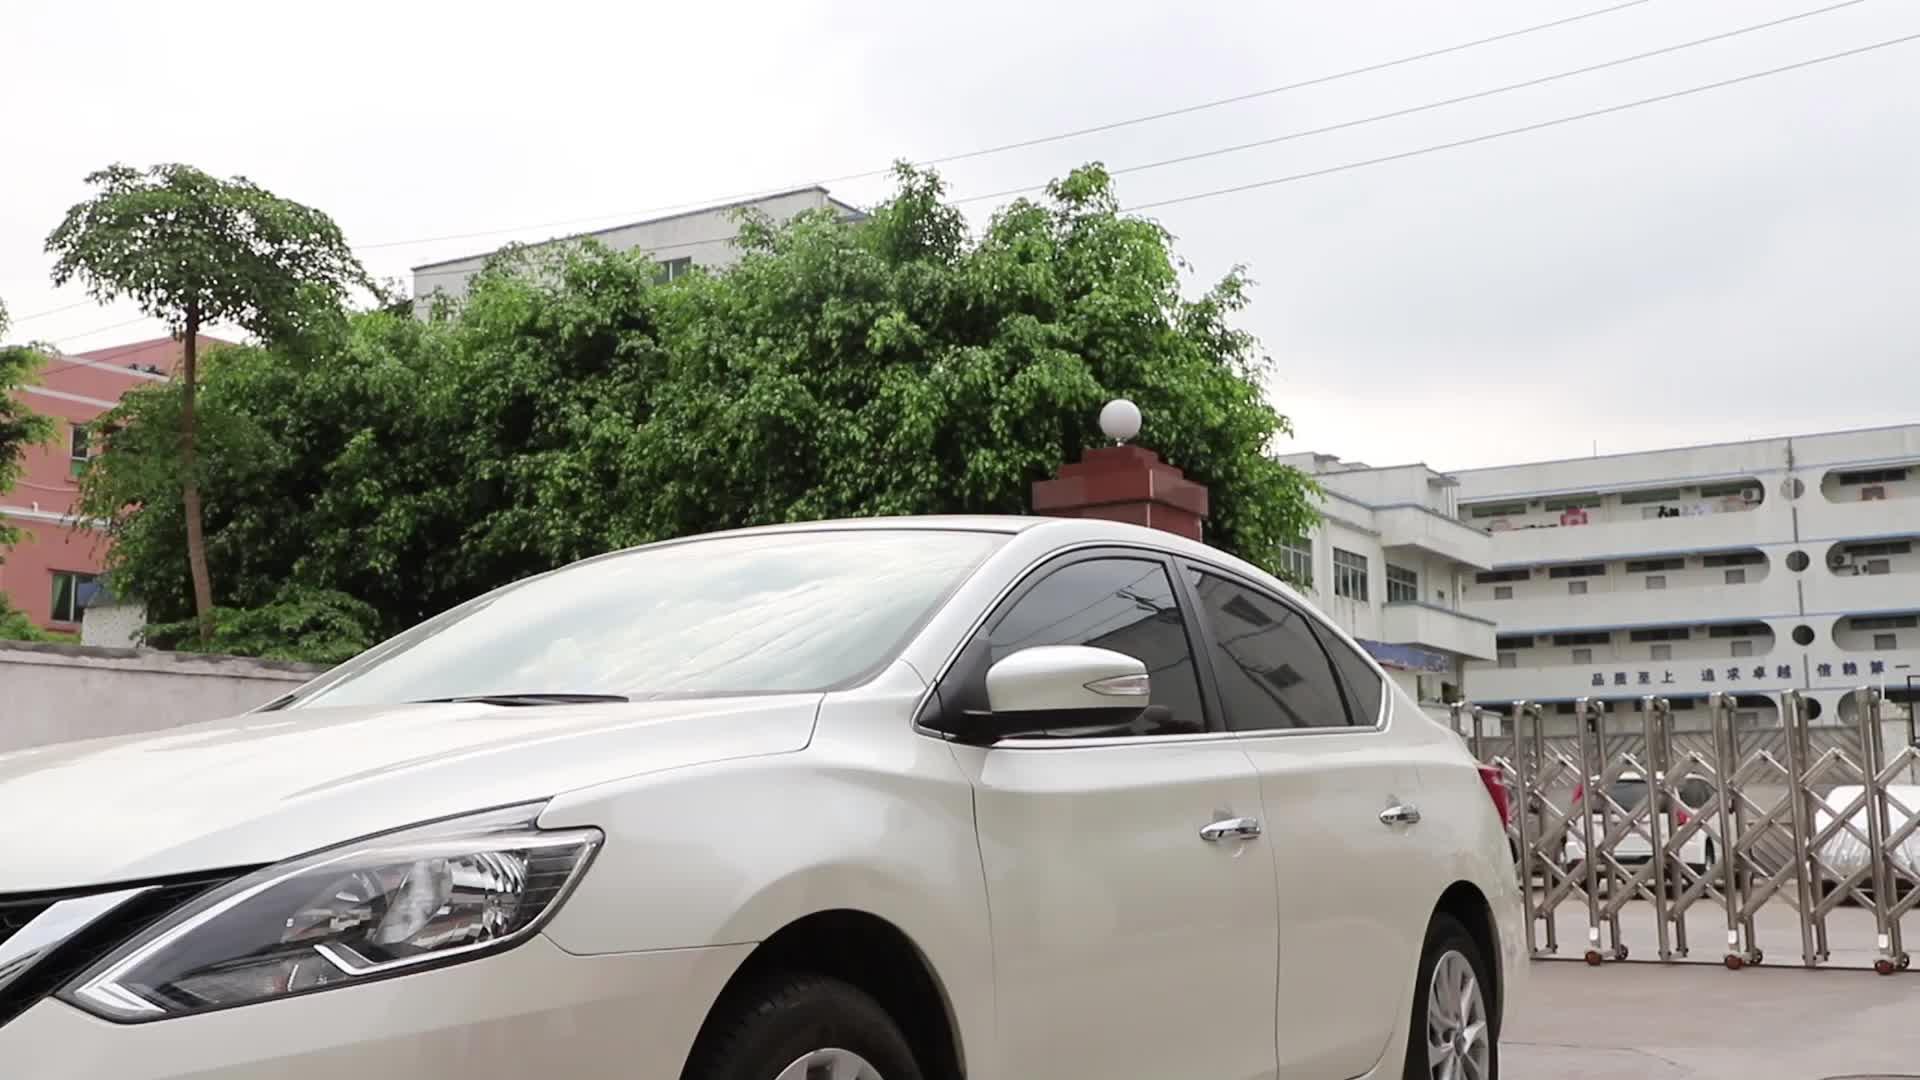 Nano Auto Car Rearview Mirror Anti Fog Film Rainproof Waterproof Screen Protector